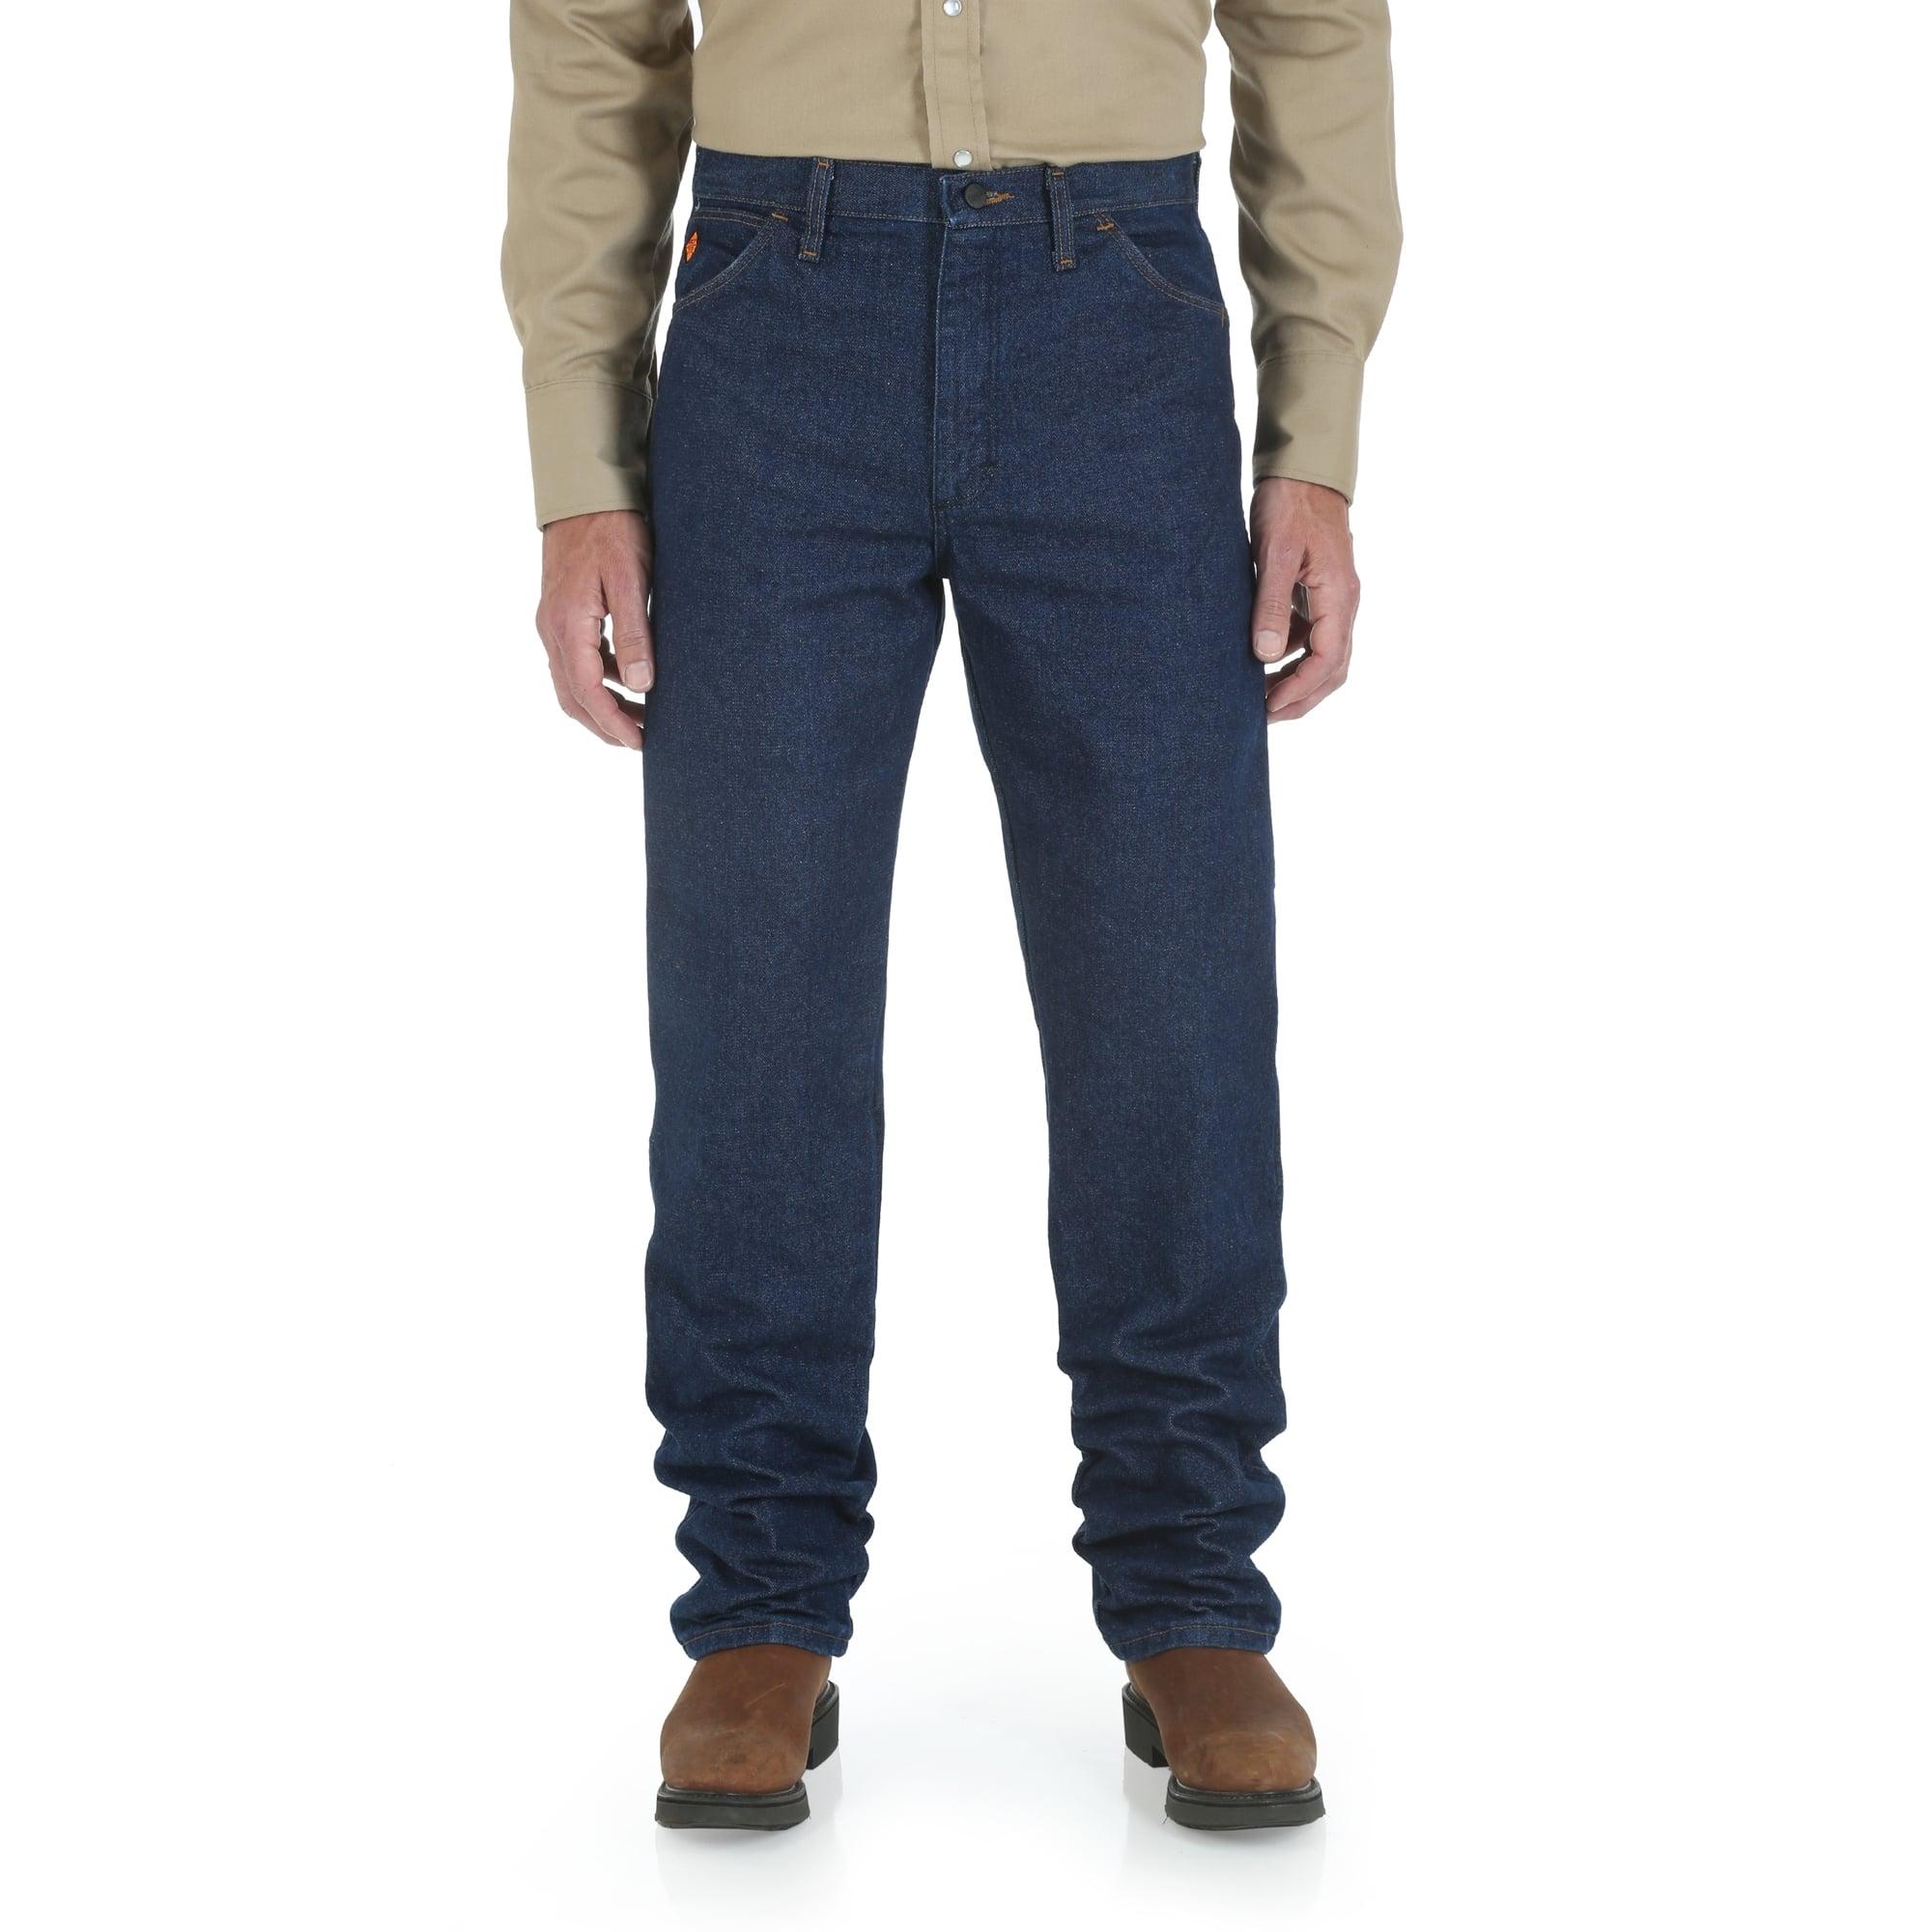 Original Fit Wrangler Flame Resistant Jeans